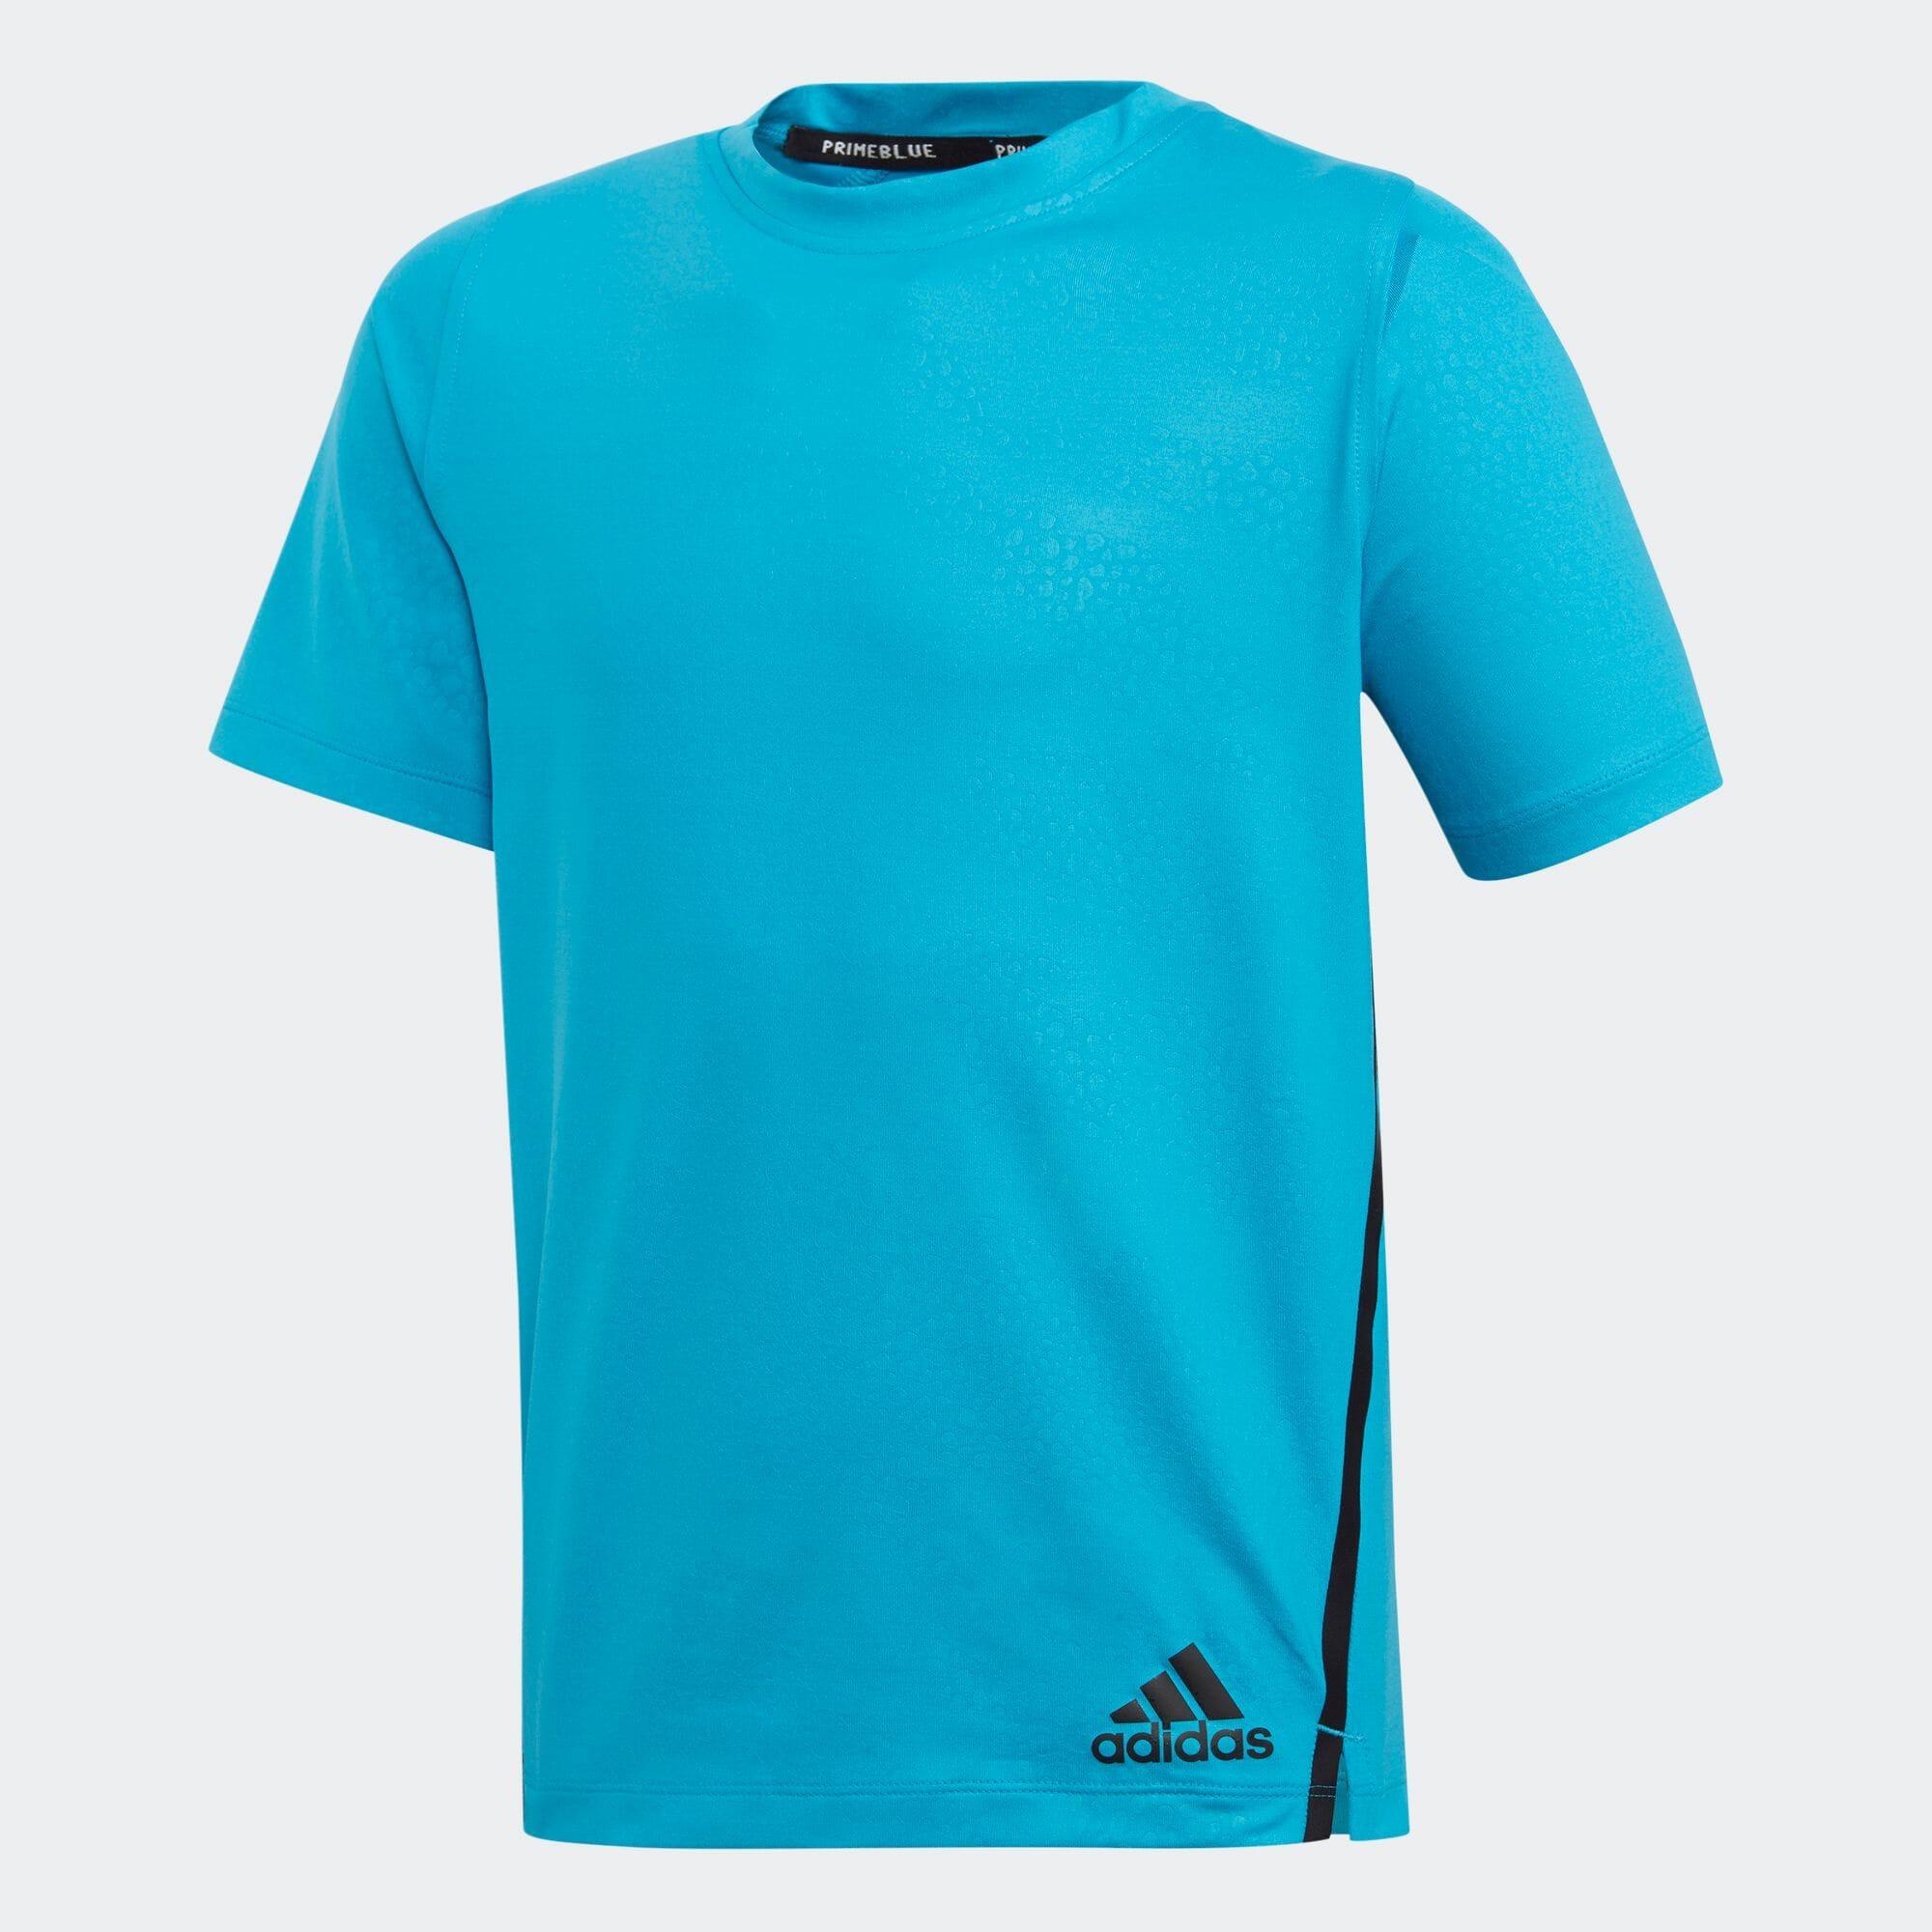 PRIMEBLUE 半袖Tシャツ / Primeblue Tee